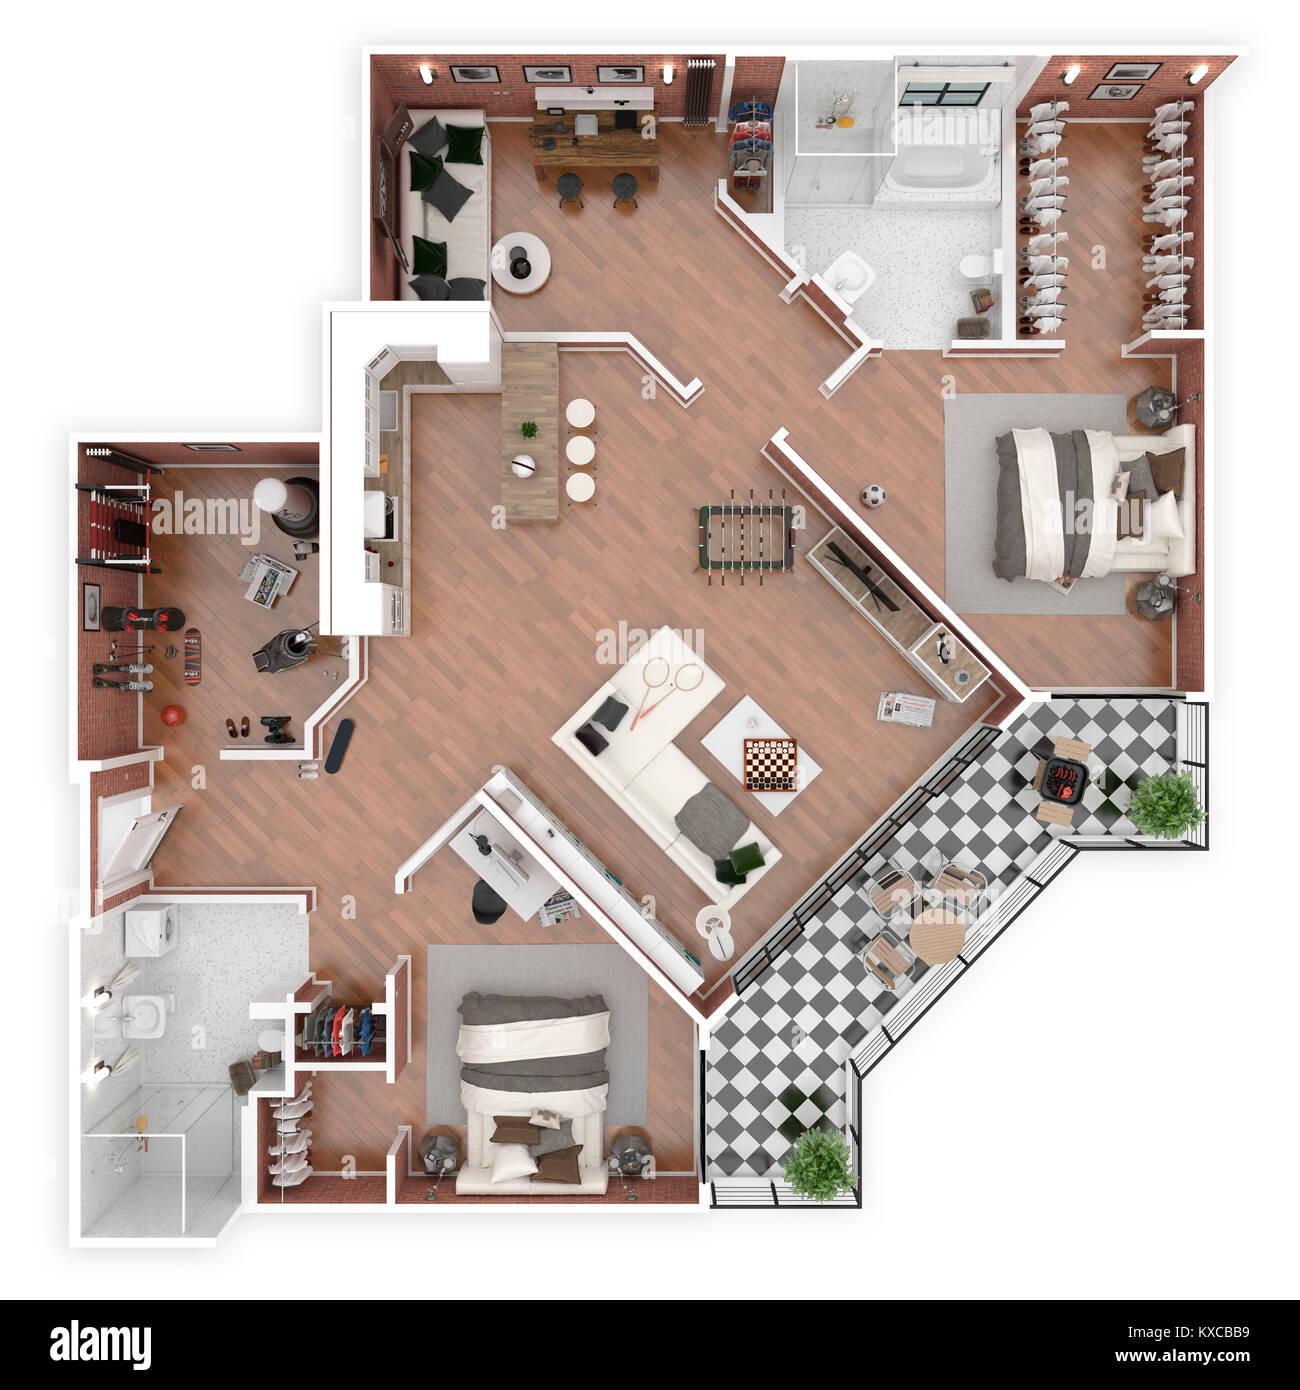 Floor plan of a house top view 3d illustration open - Planos de casa en 3d ...